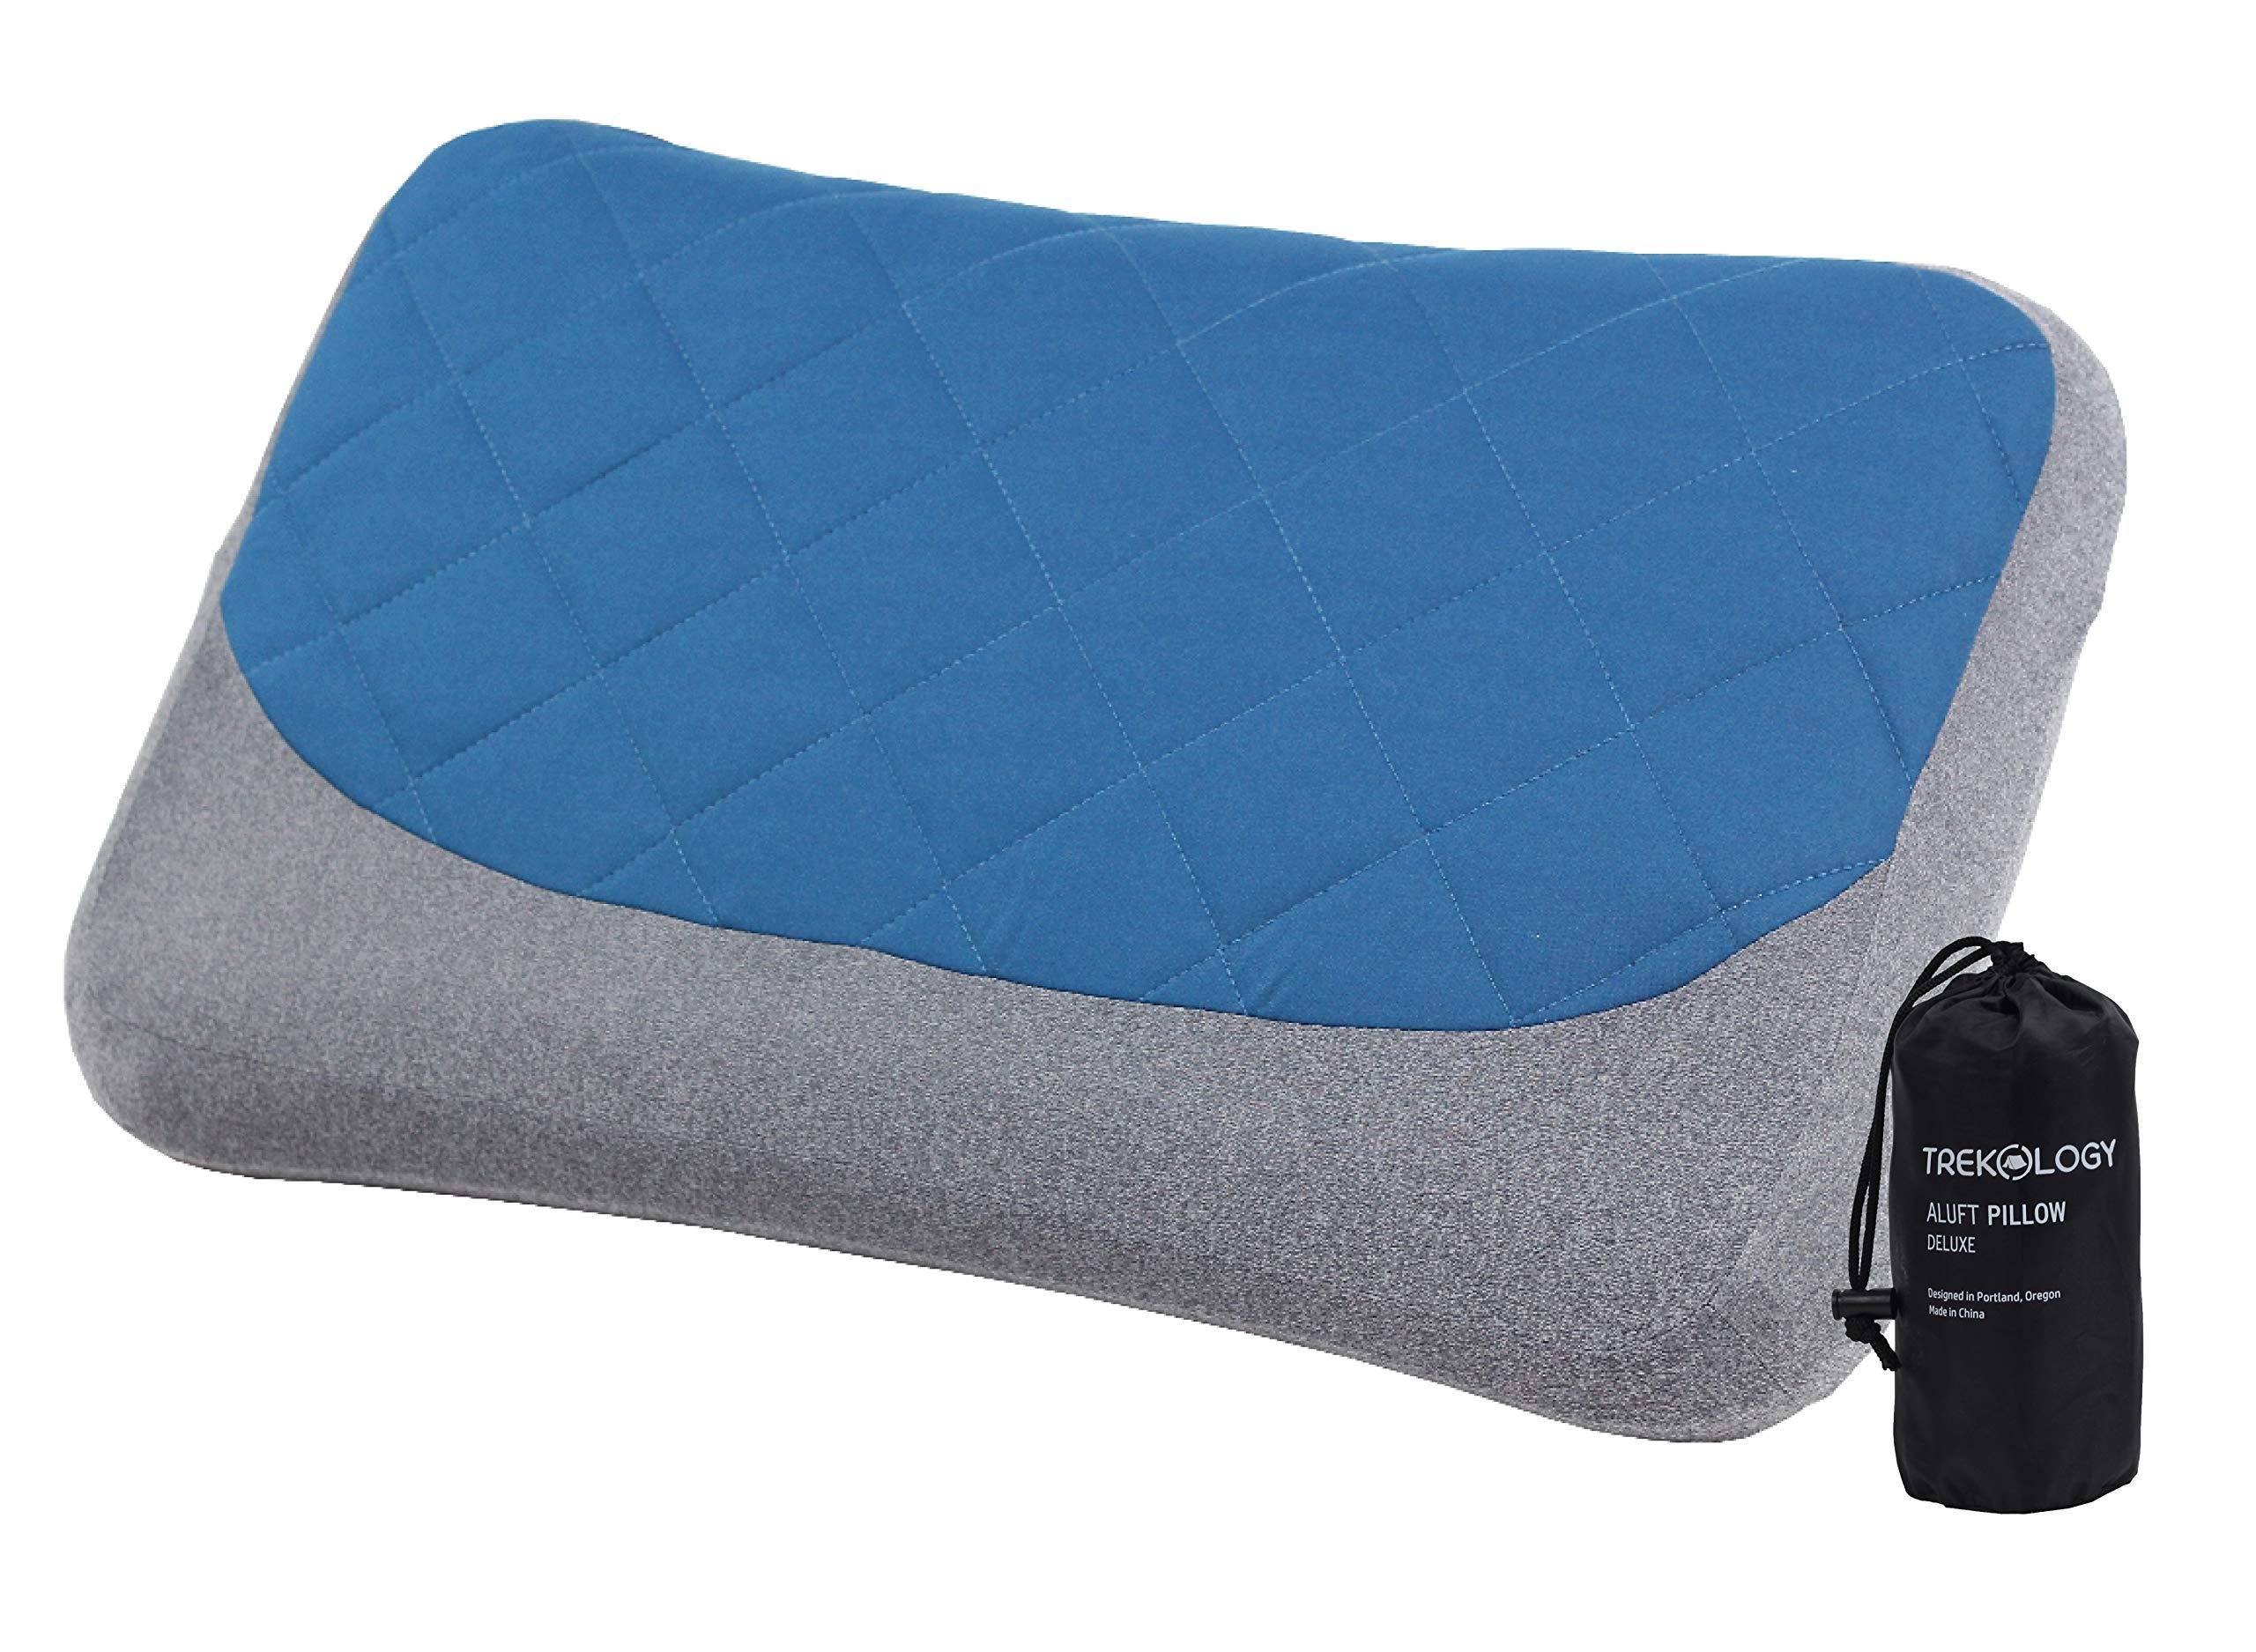 Terrific Easy To Inflate Deflate Transport Comfortable Wheel Chair Short Links Chair Design For Home Short Linksinfo